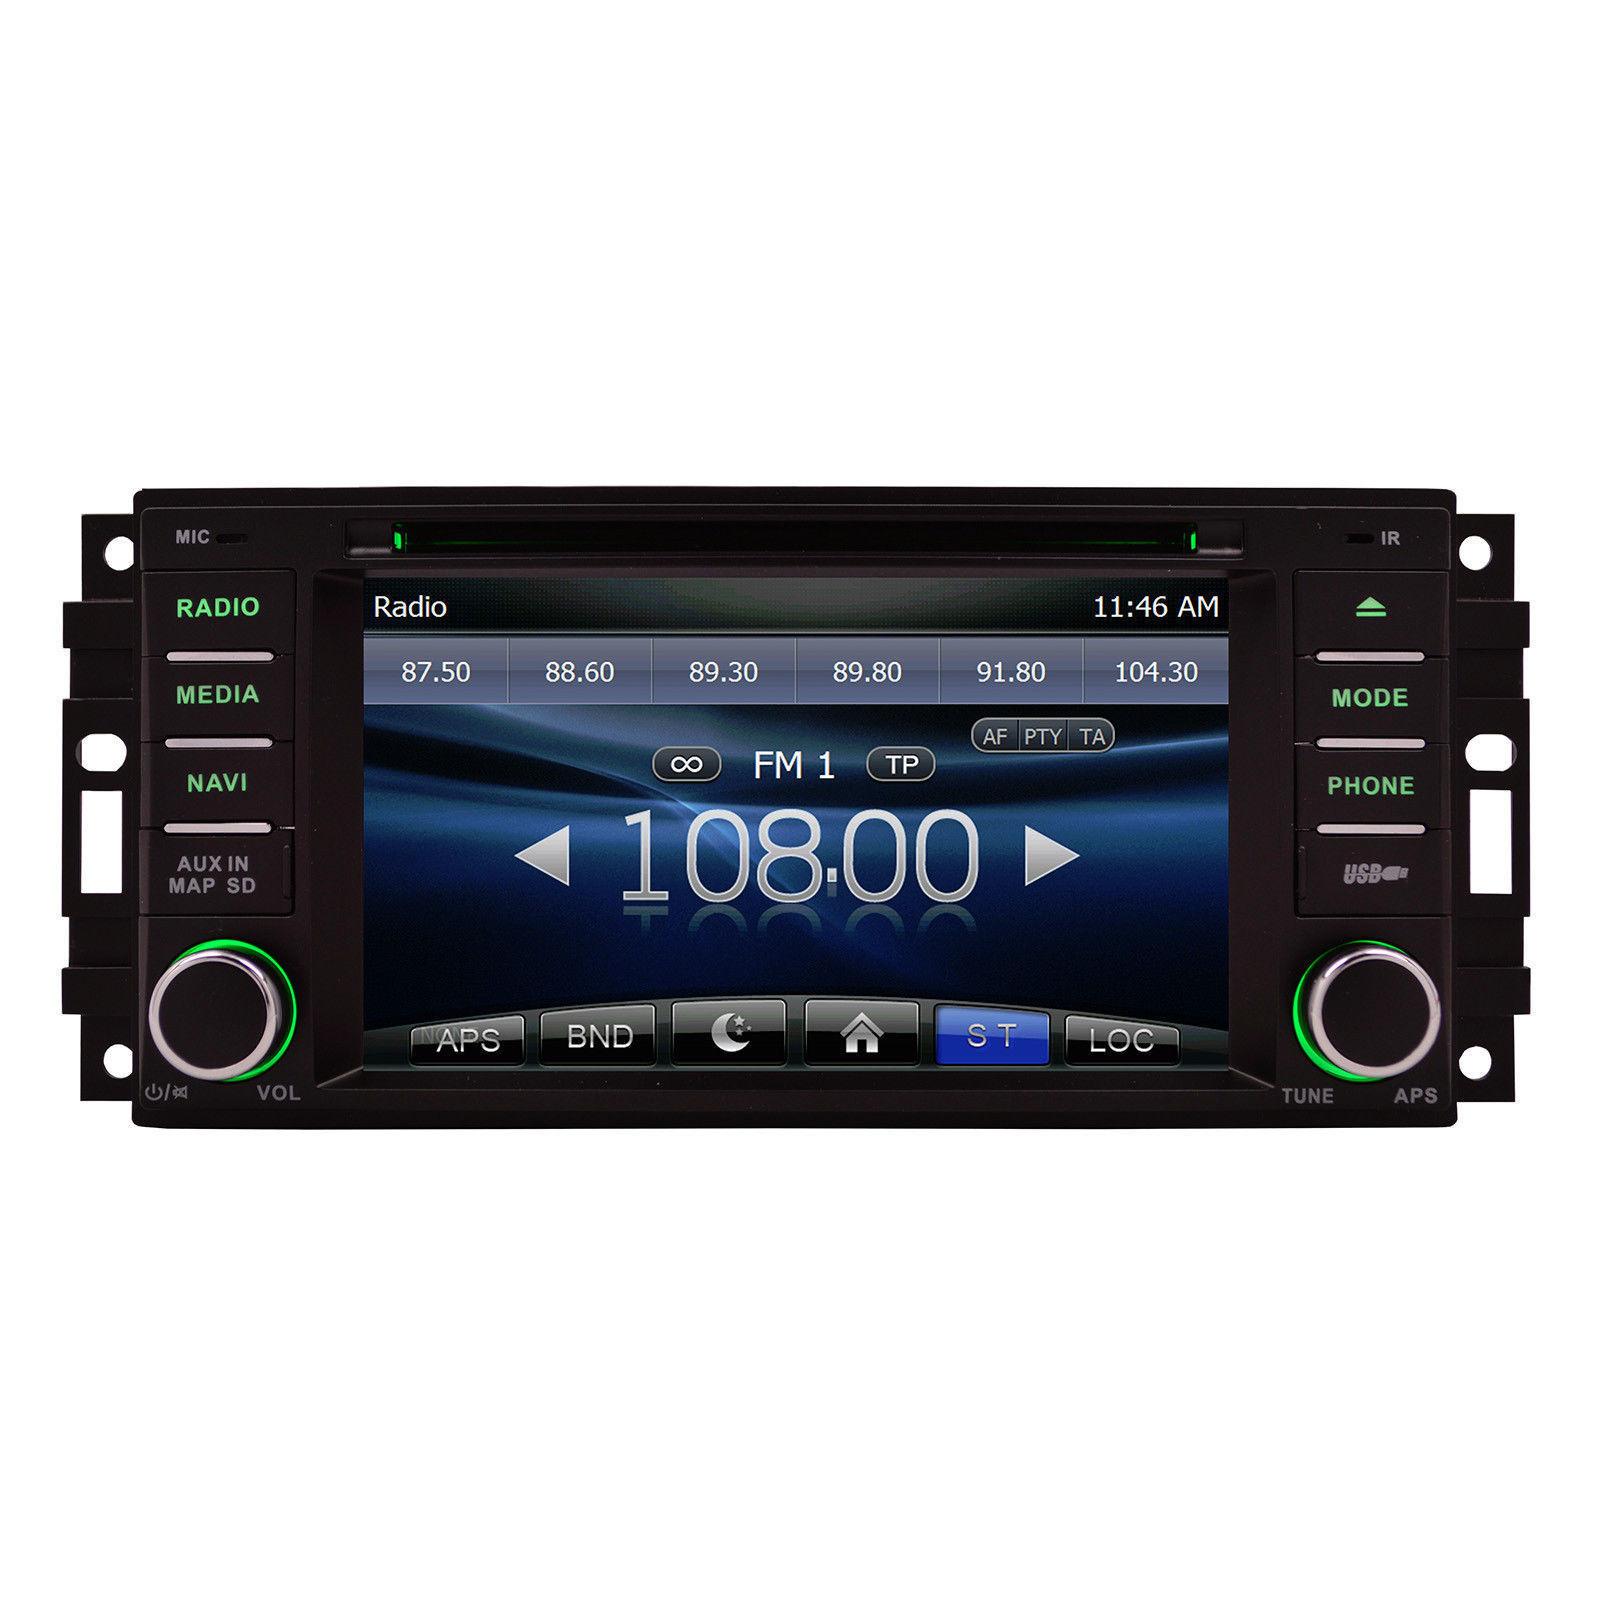 OTTONAVI Chrysler Sebring 2007-2011 K-Series Navigation Radio image 10